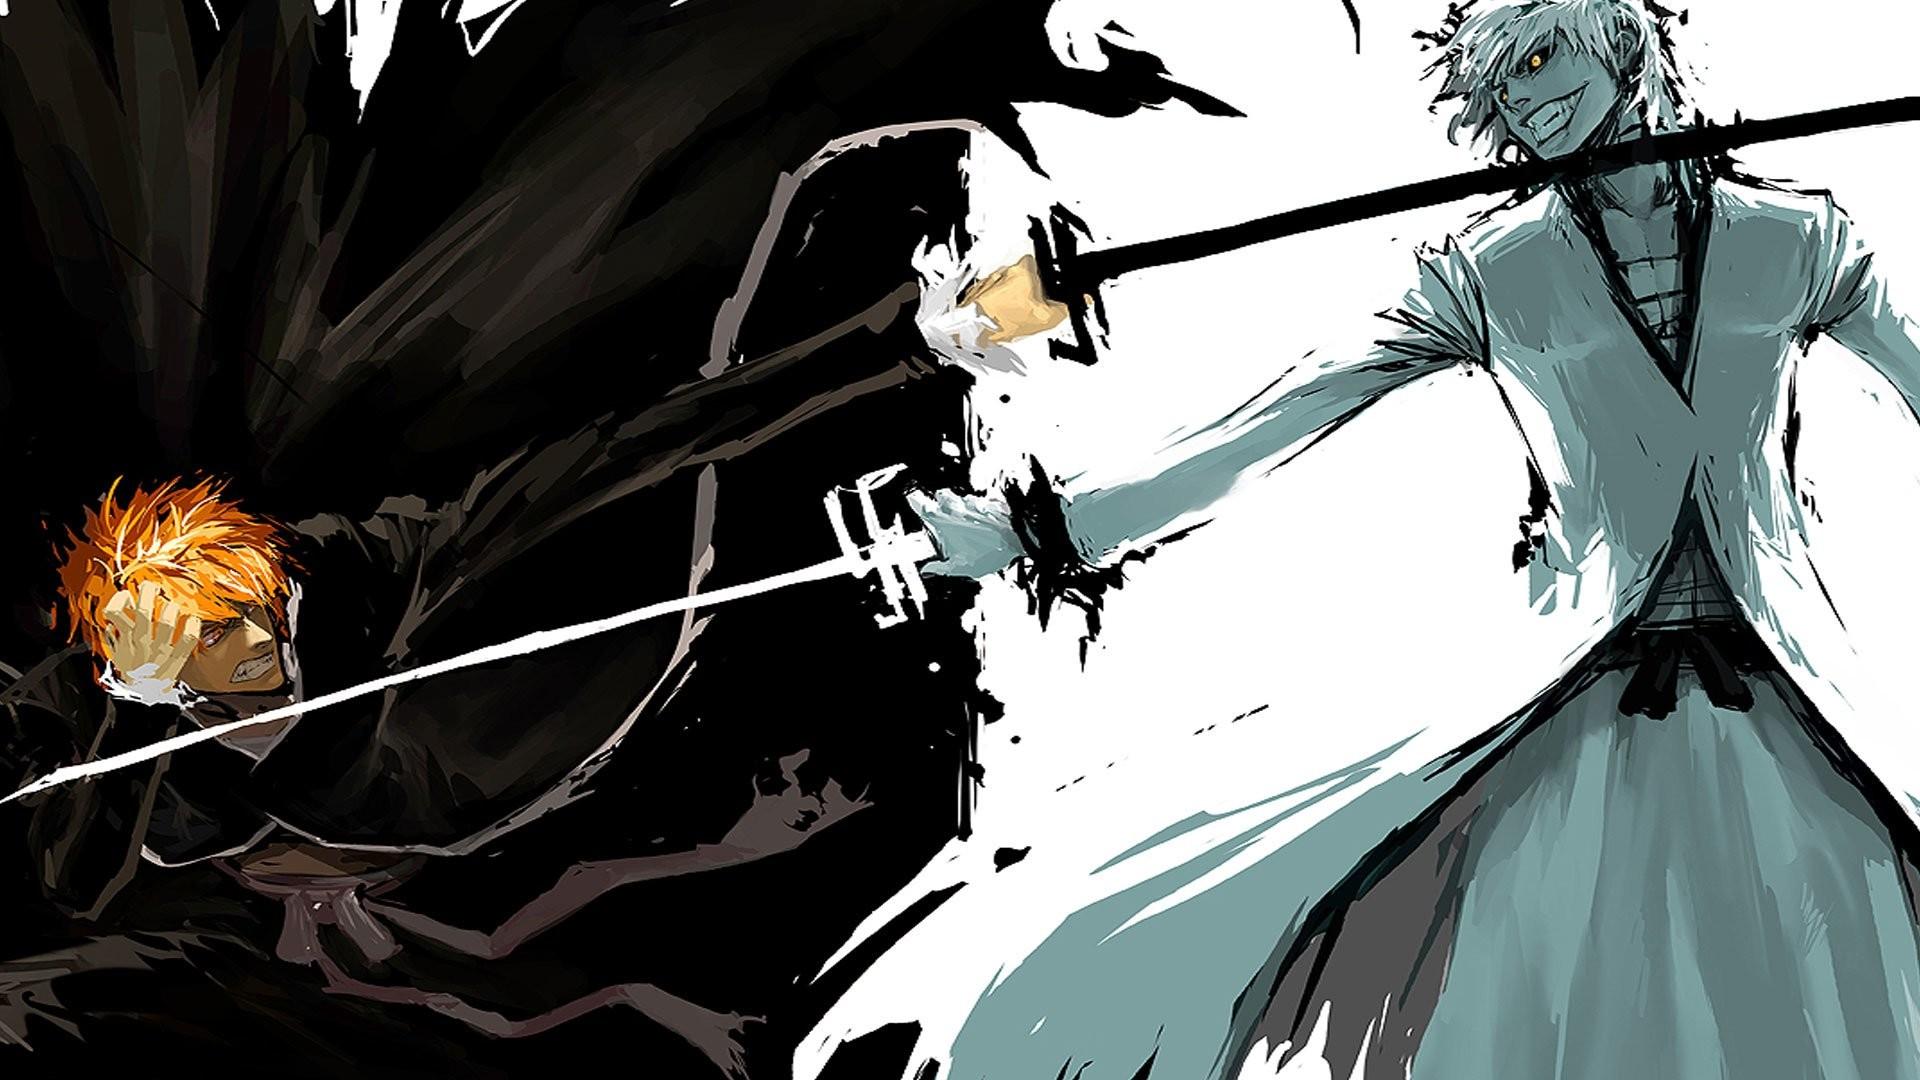 HD Wallpaper | Background ID:2499. Anime Bleach